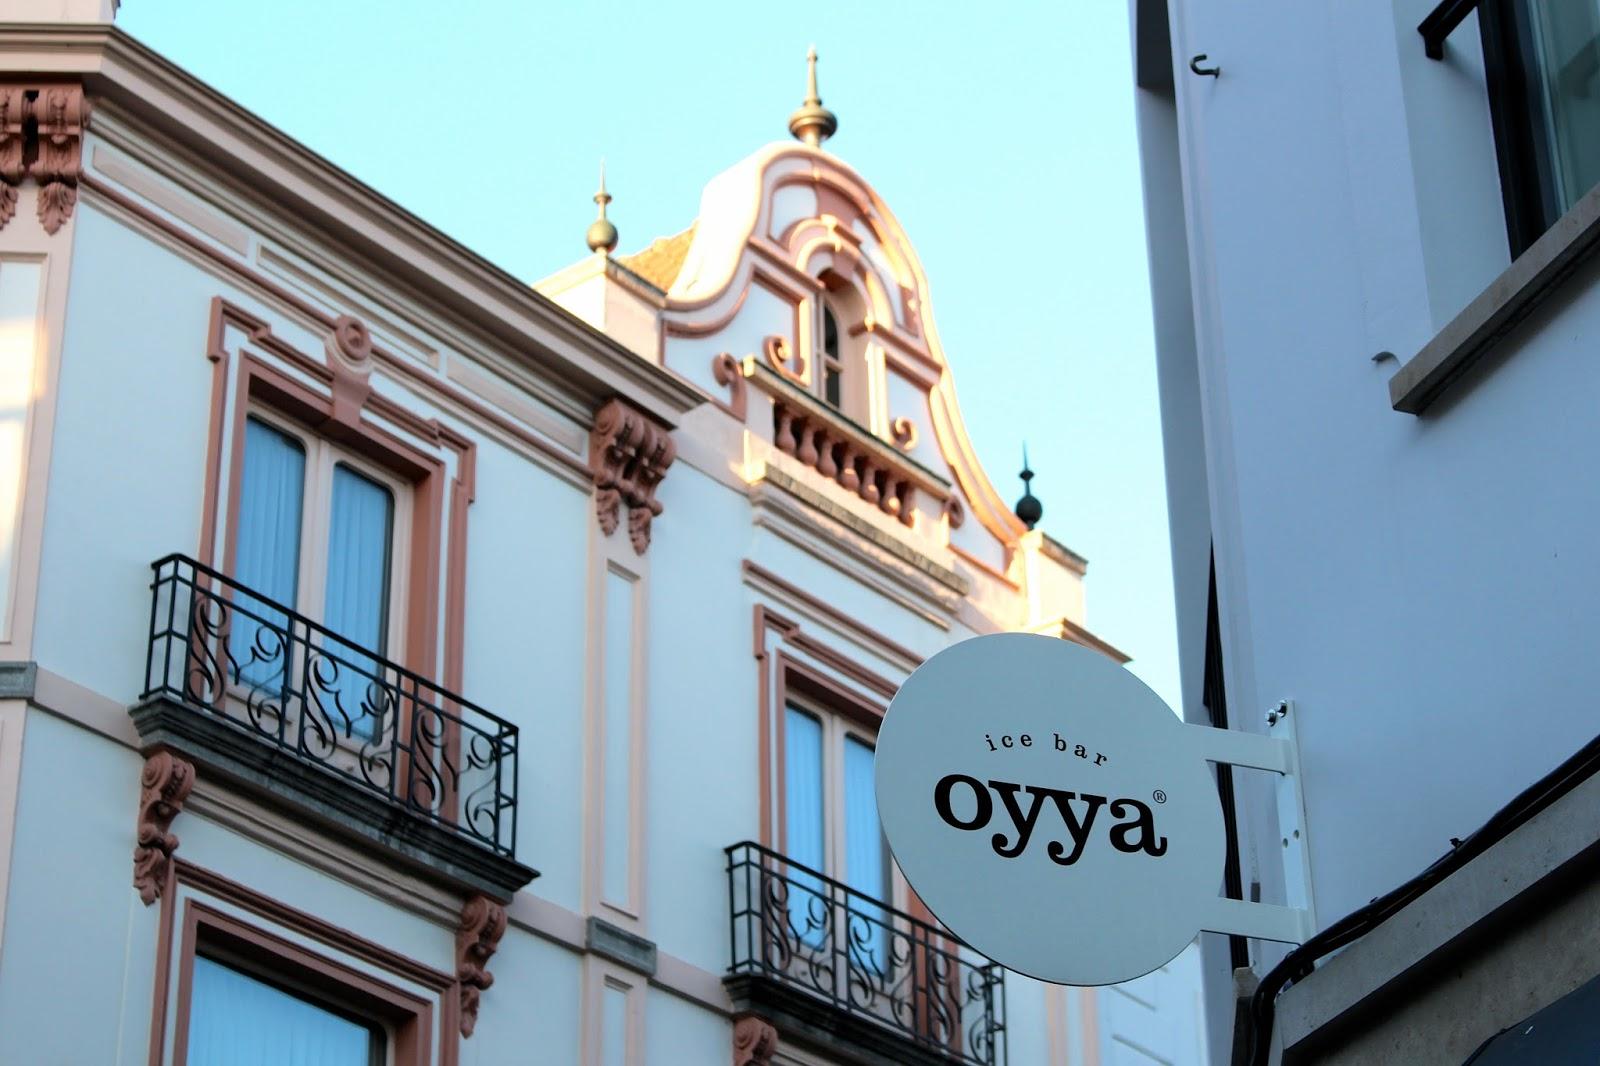 Oyya ice cream bruges belgium travel blog review